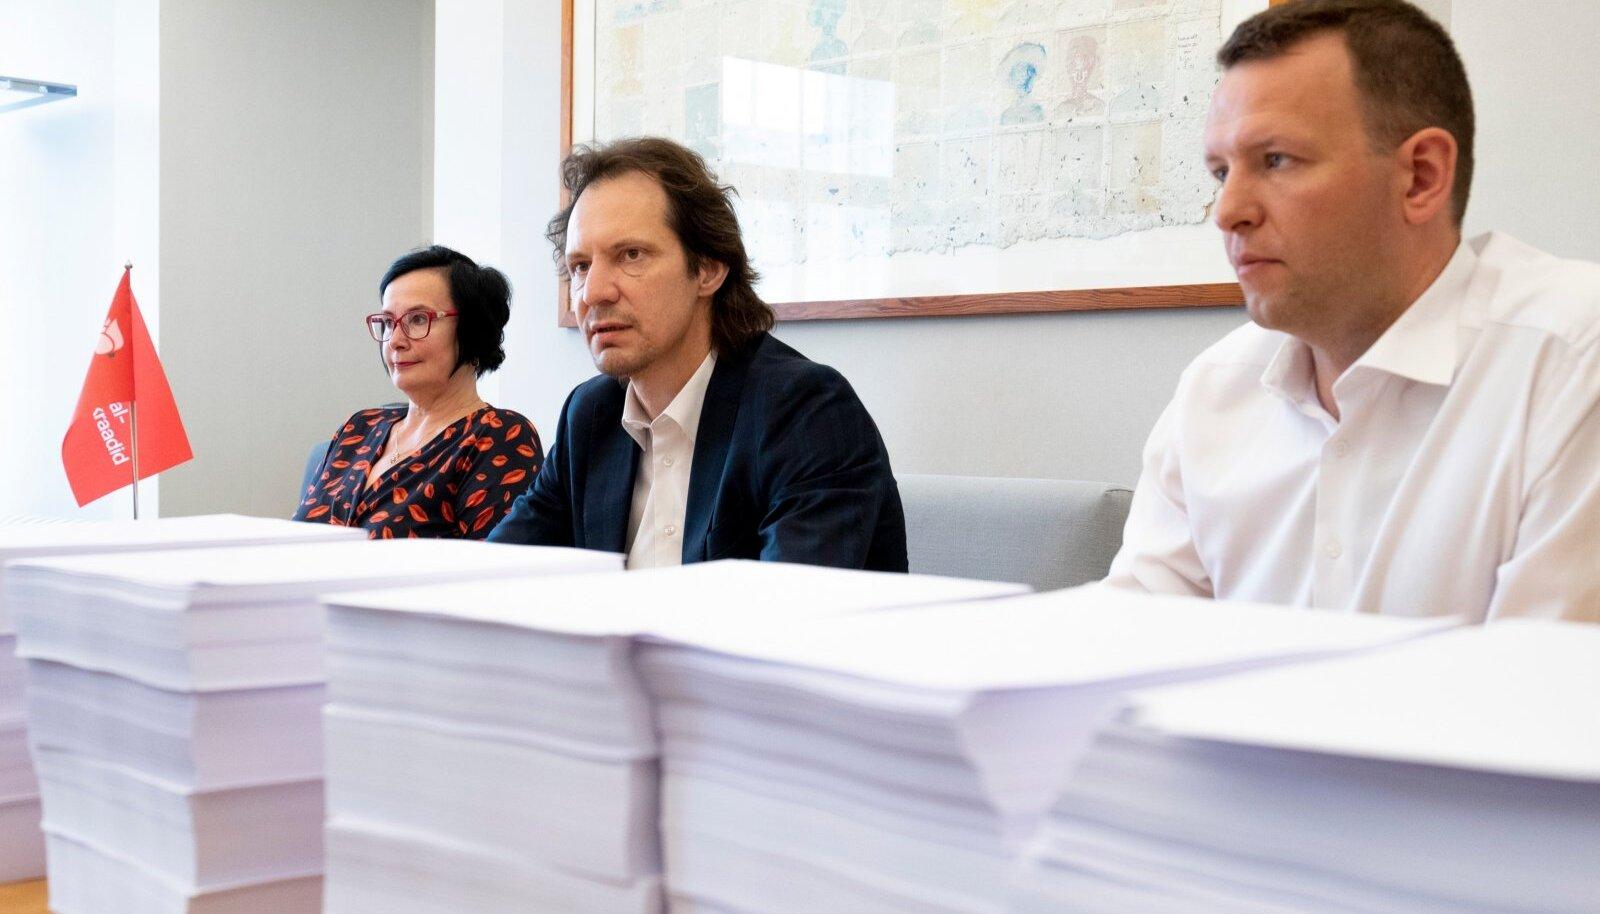 Suve alguses SDE juba katsetas 50 000 parandusettepaneku trikki.